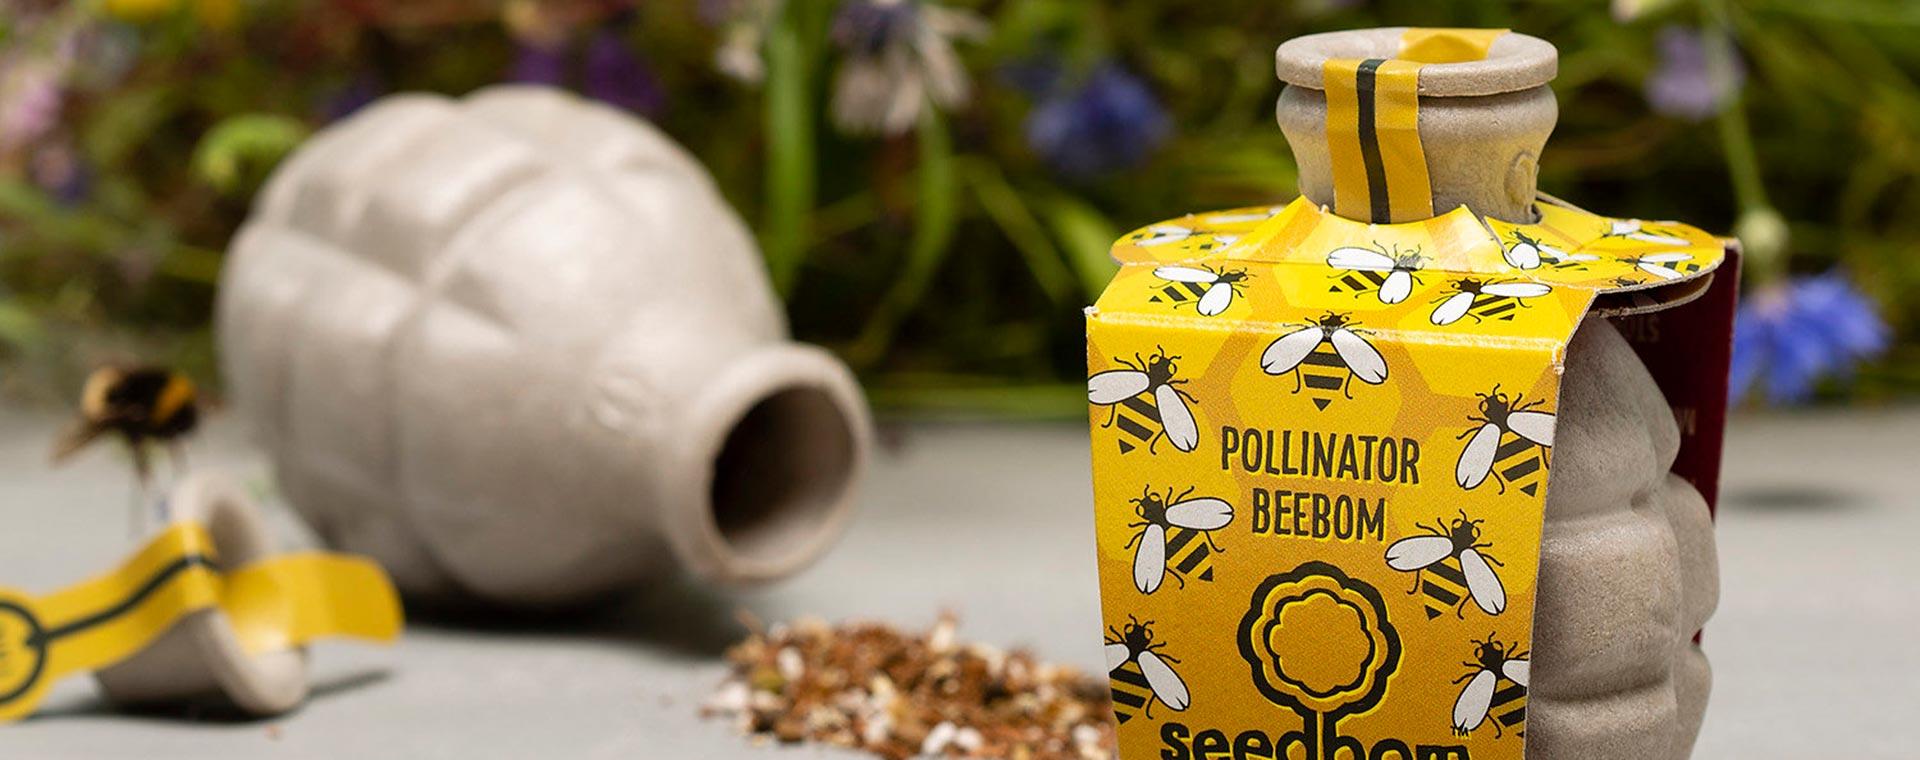 Pollinator Beebom Seedbom Seedbom